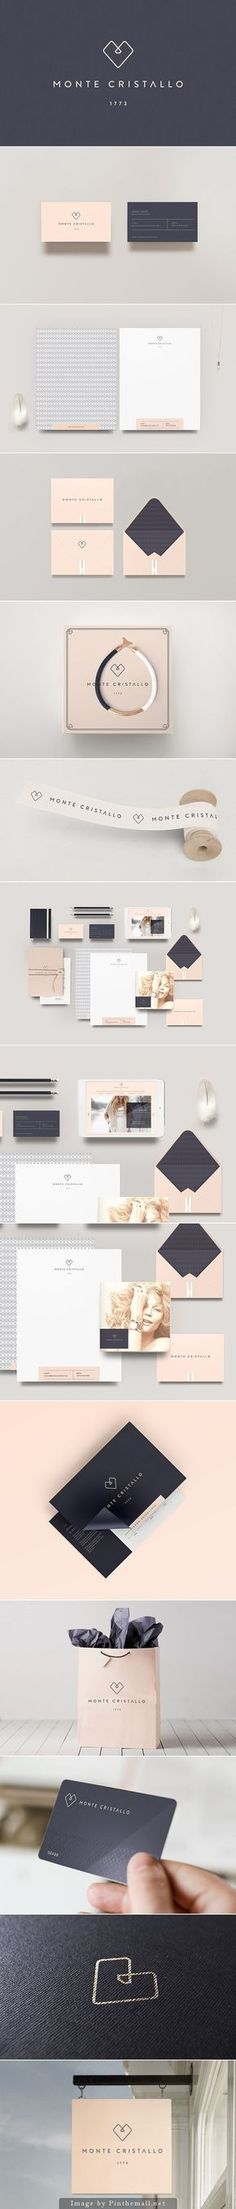 Monte Cristallo Branding | Fivestar Branding – Design and Branding Agency & Inspiration Gallery